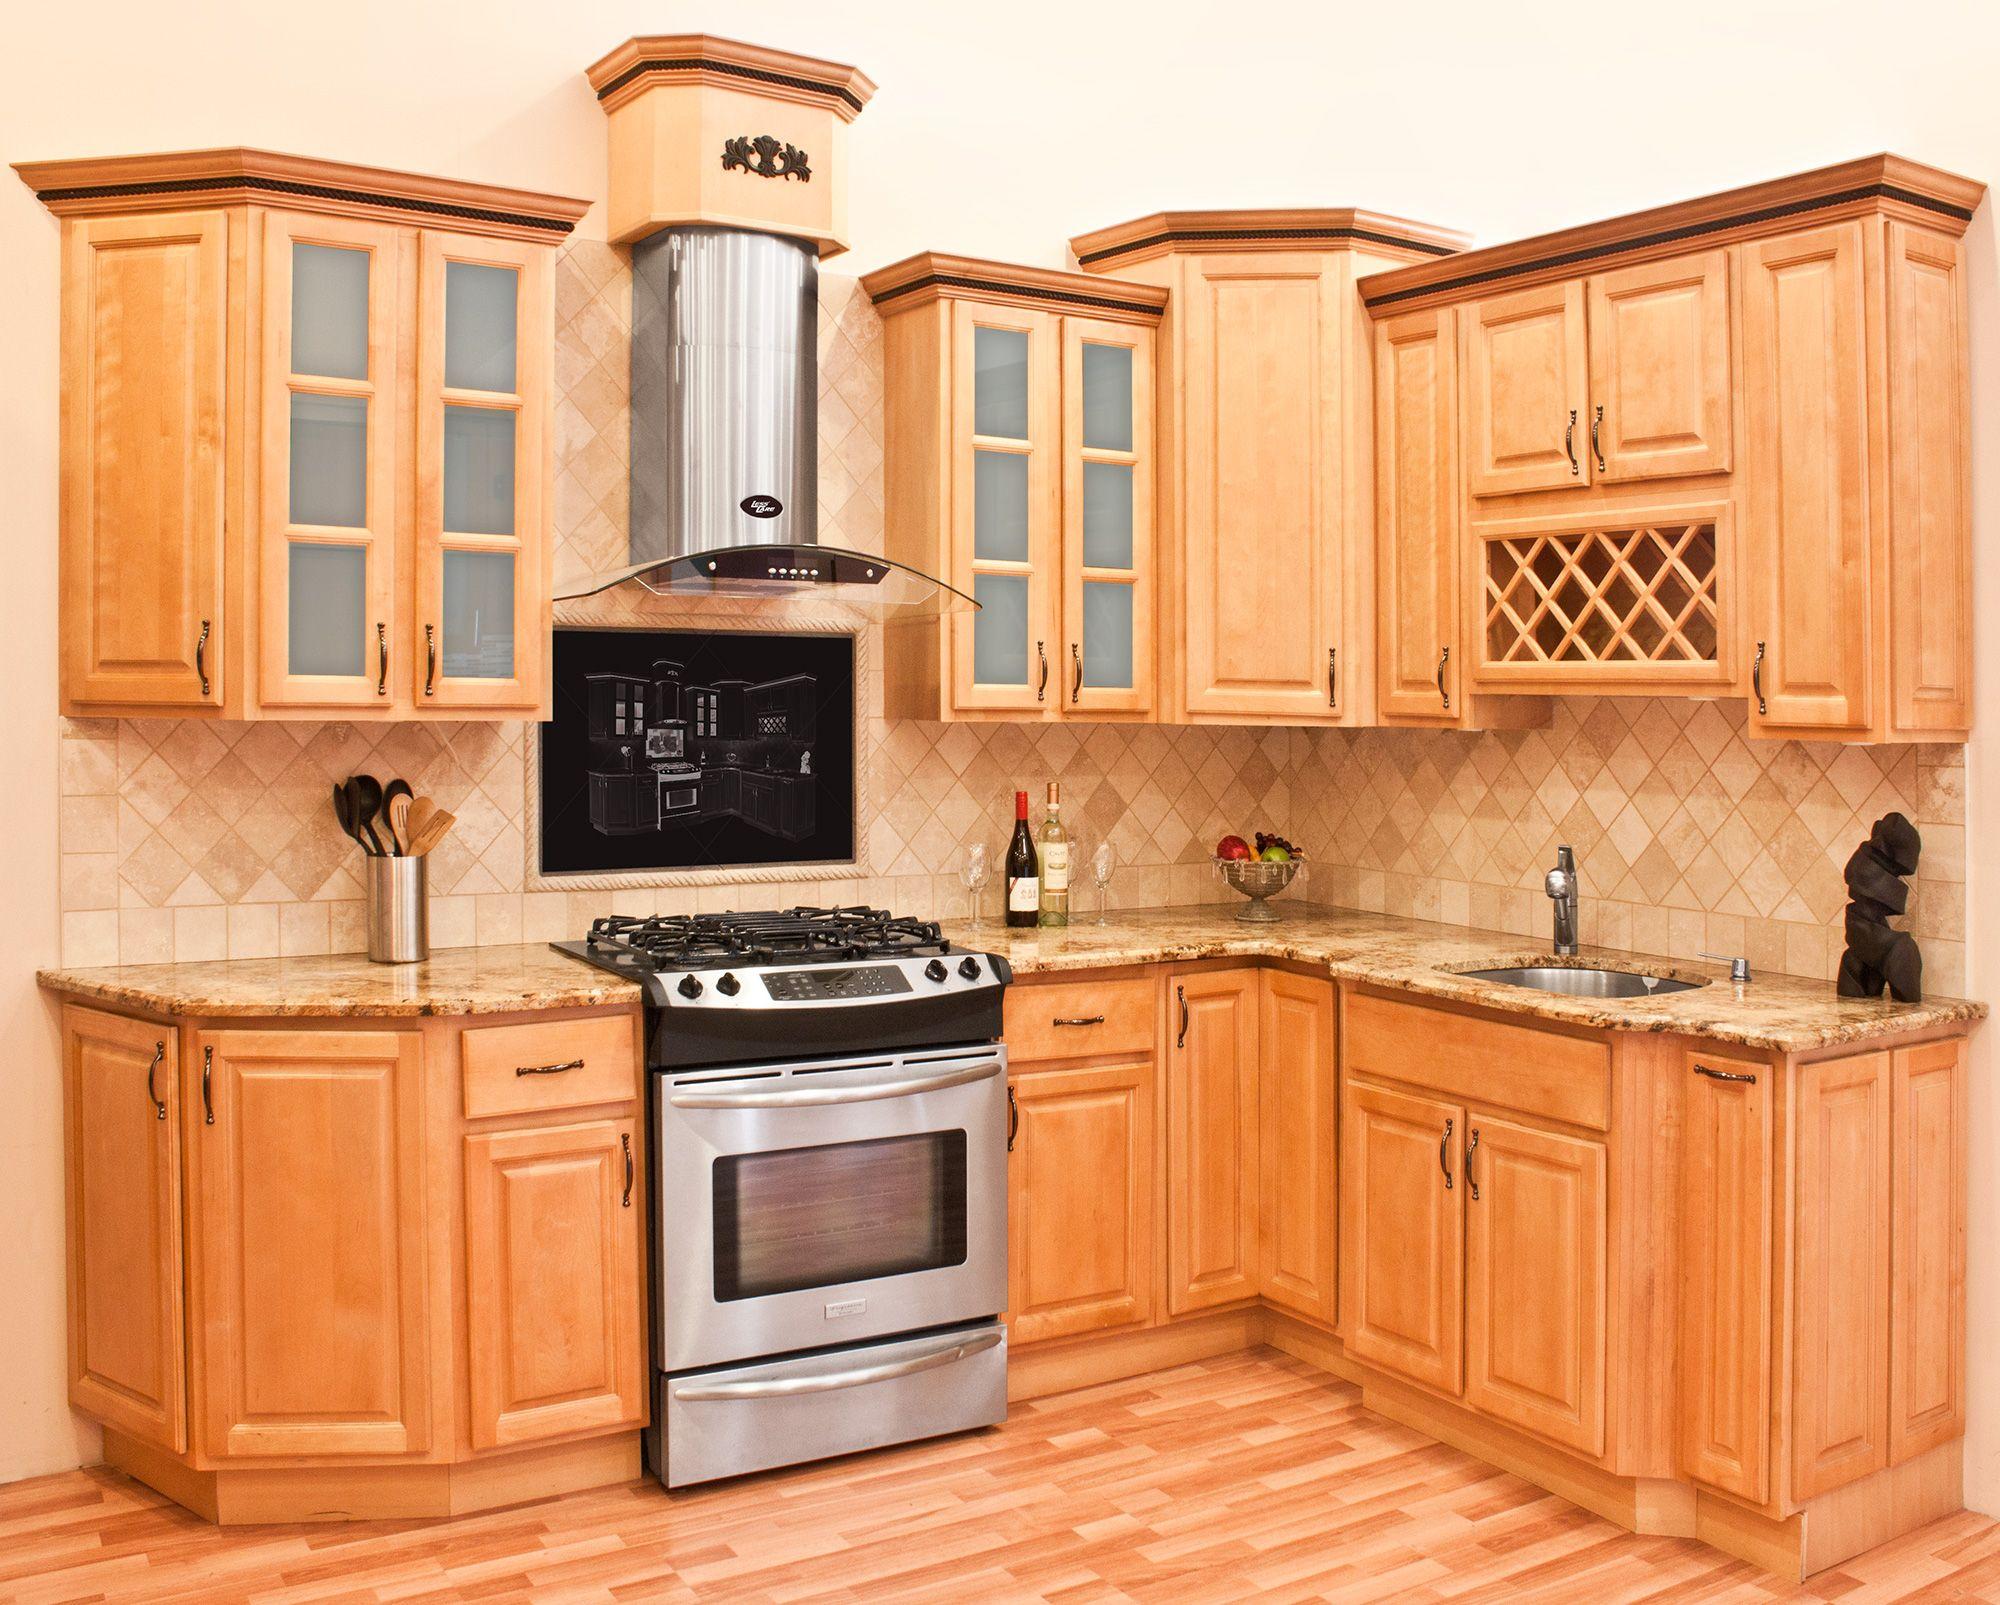 Best Backsplash For Kitchen With Honey Oak Cabinets Google 400 x 300